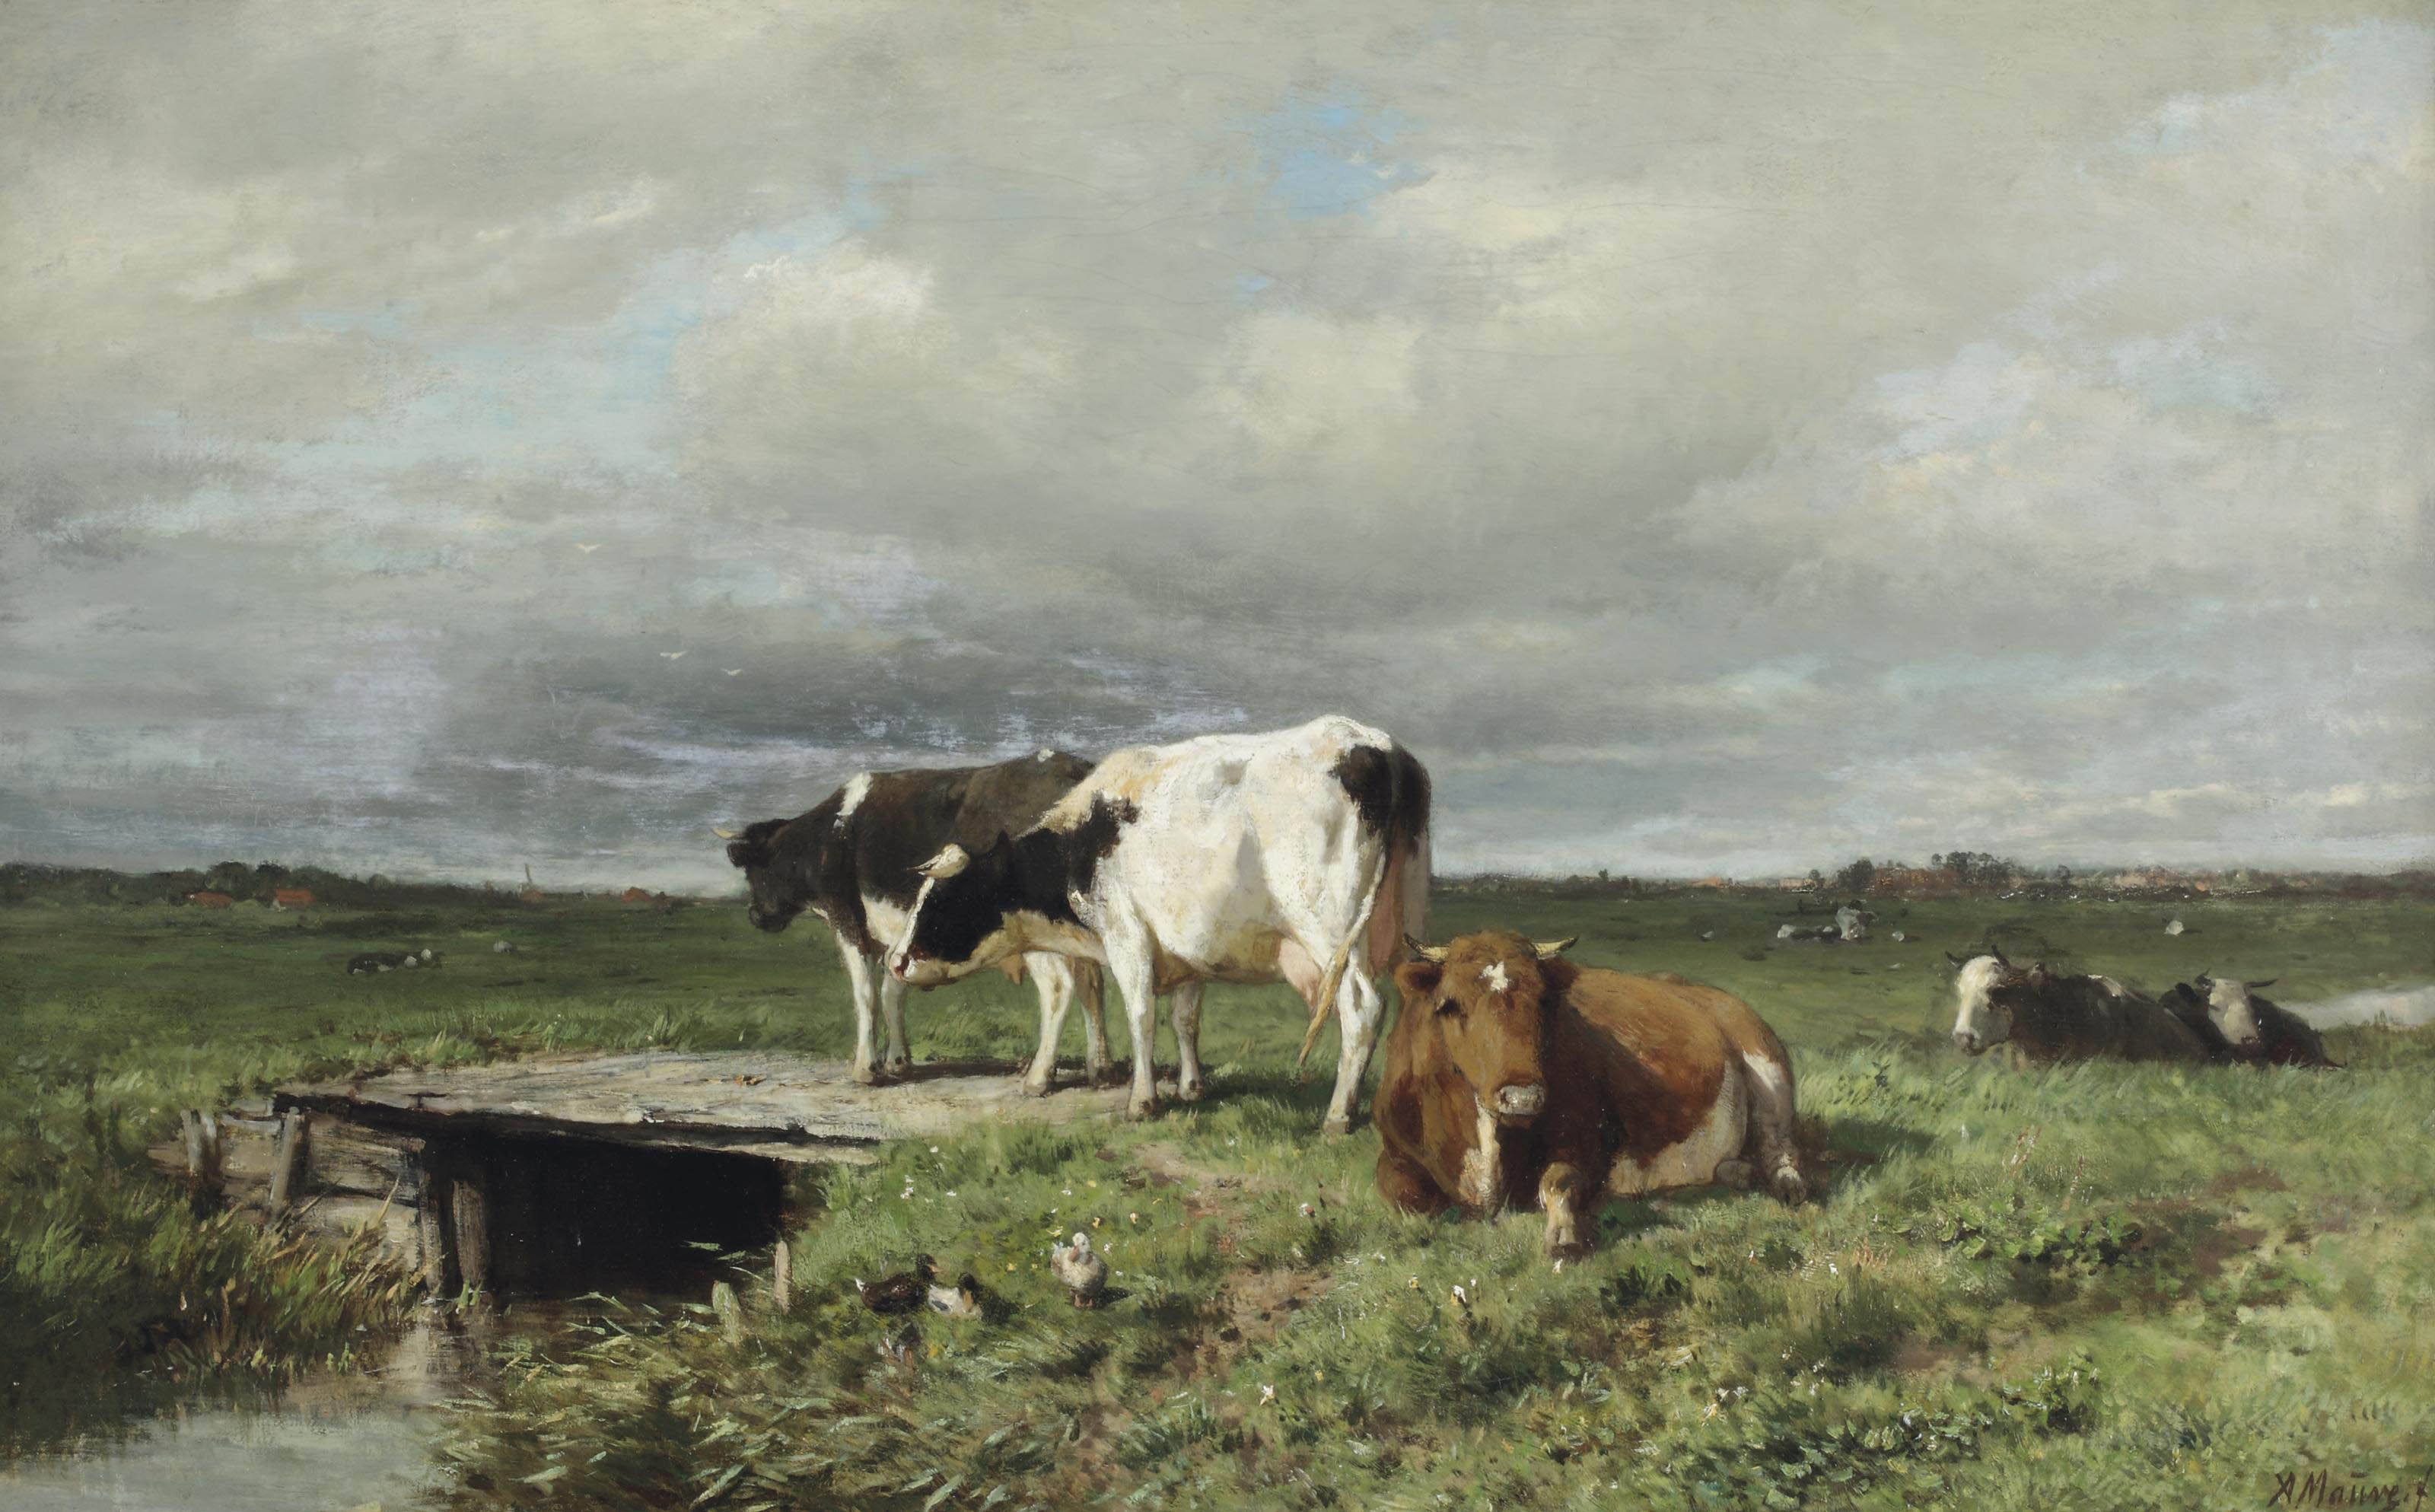 Cattle in an extensive polder landscape